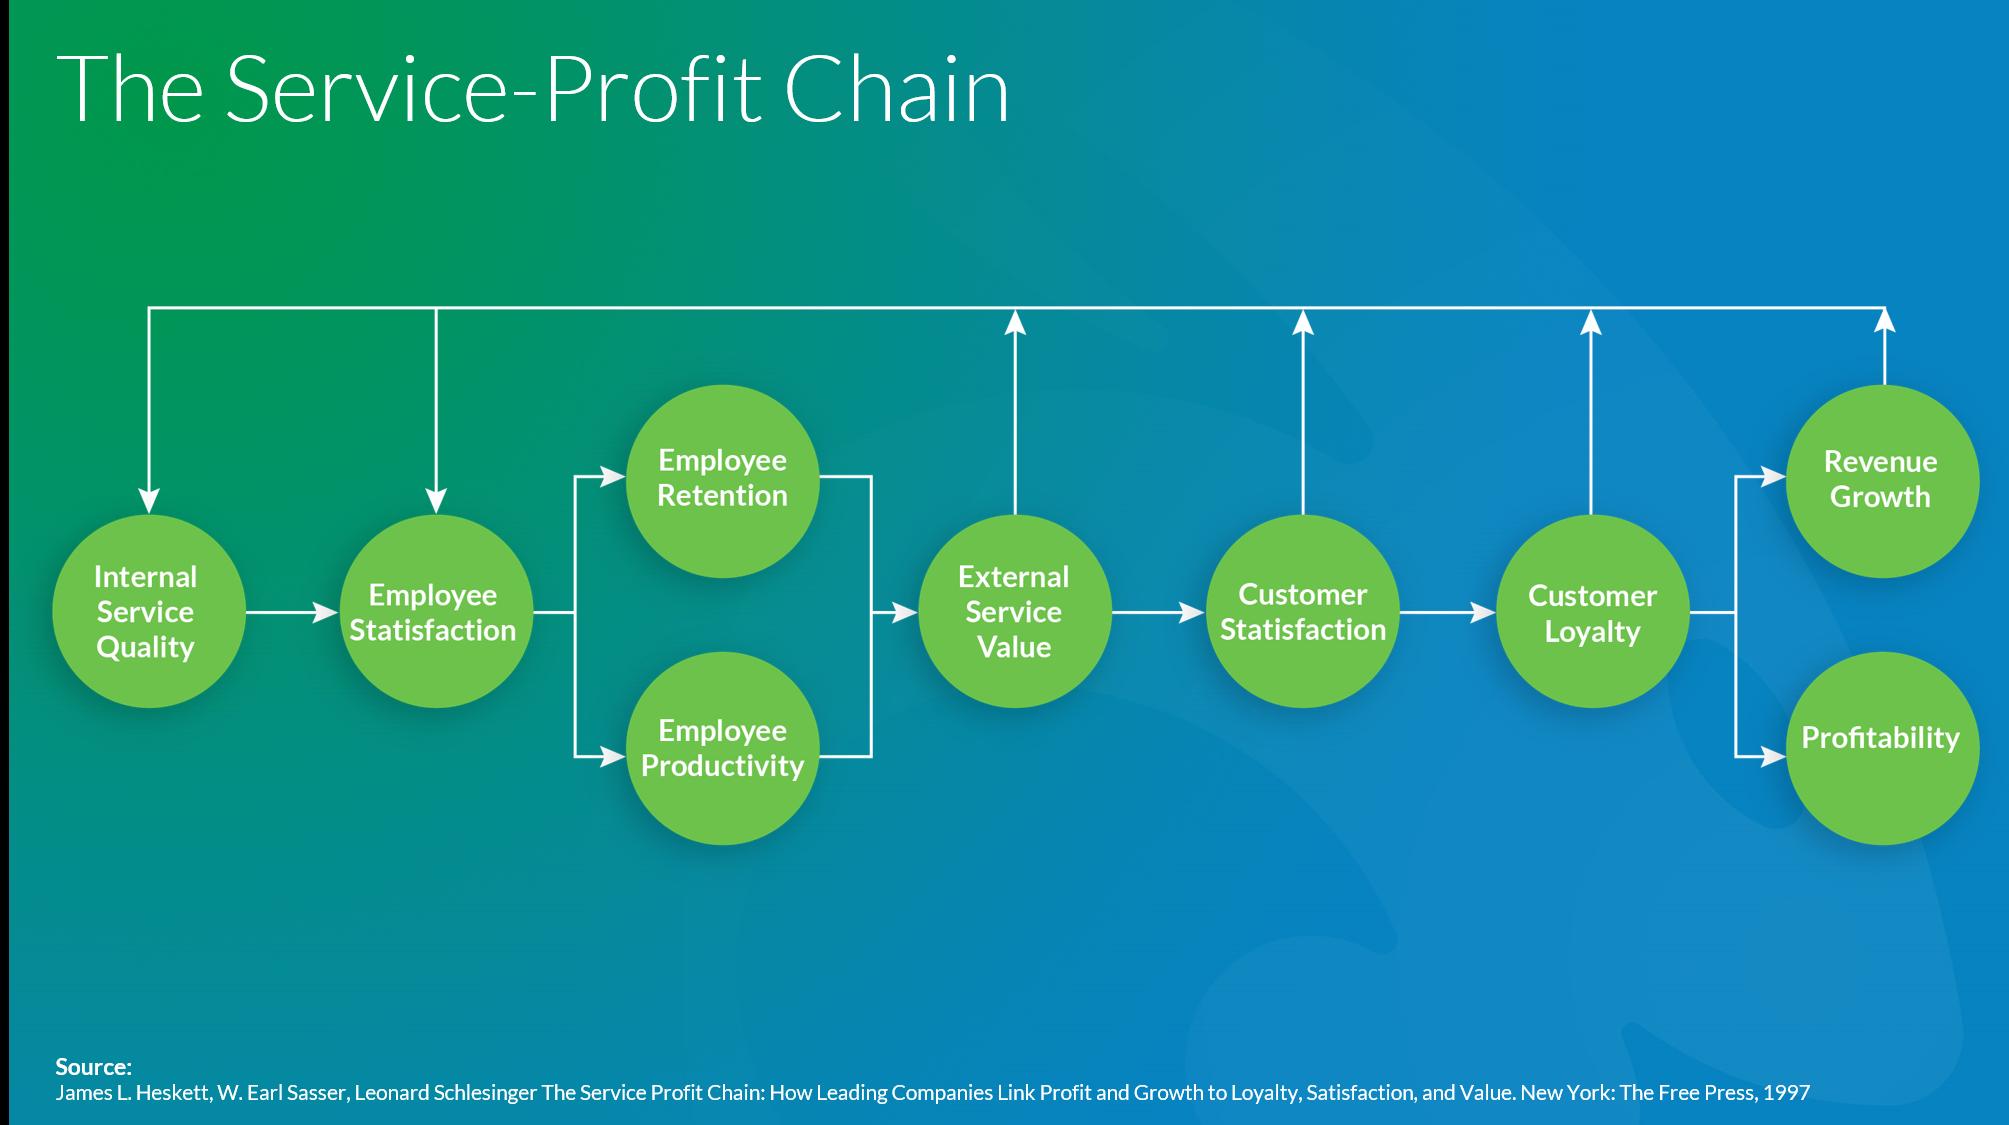 Service-Profit Chain